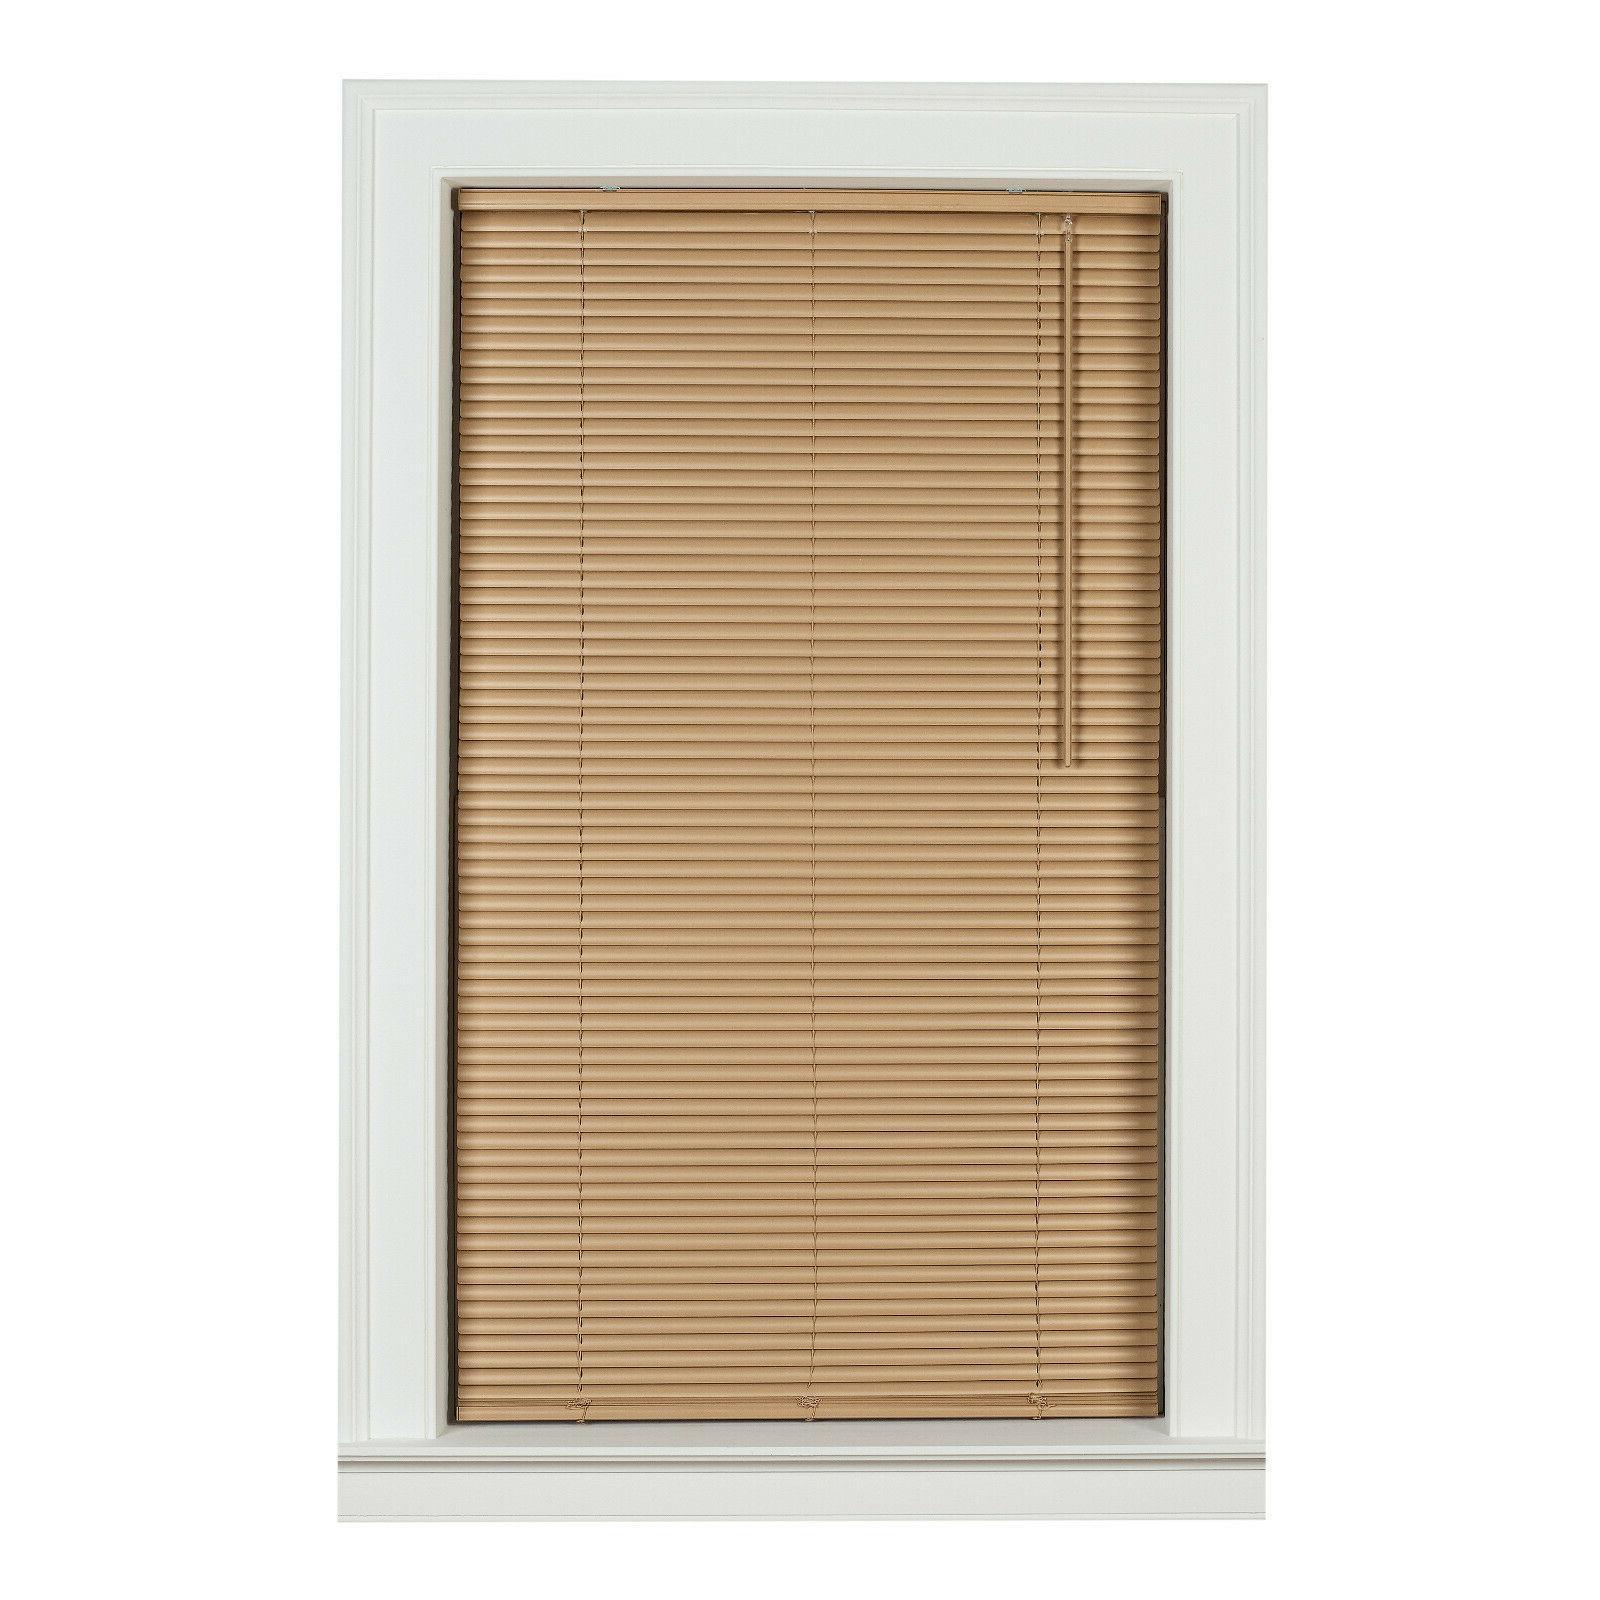 1 inch cordless room darkening vinyl blinds